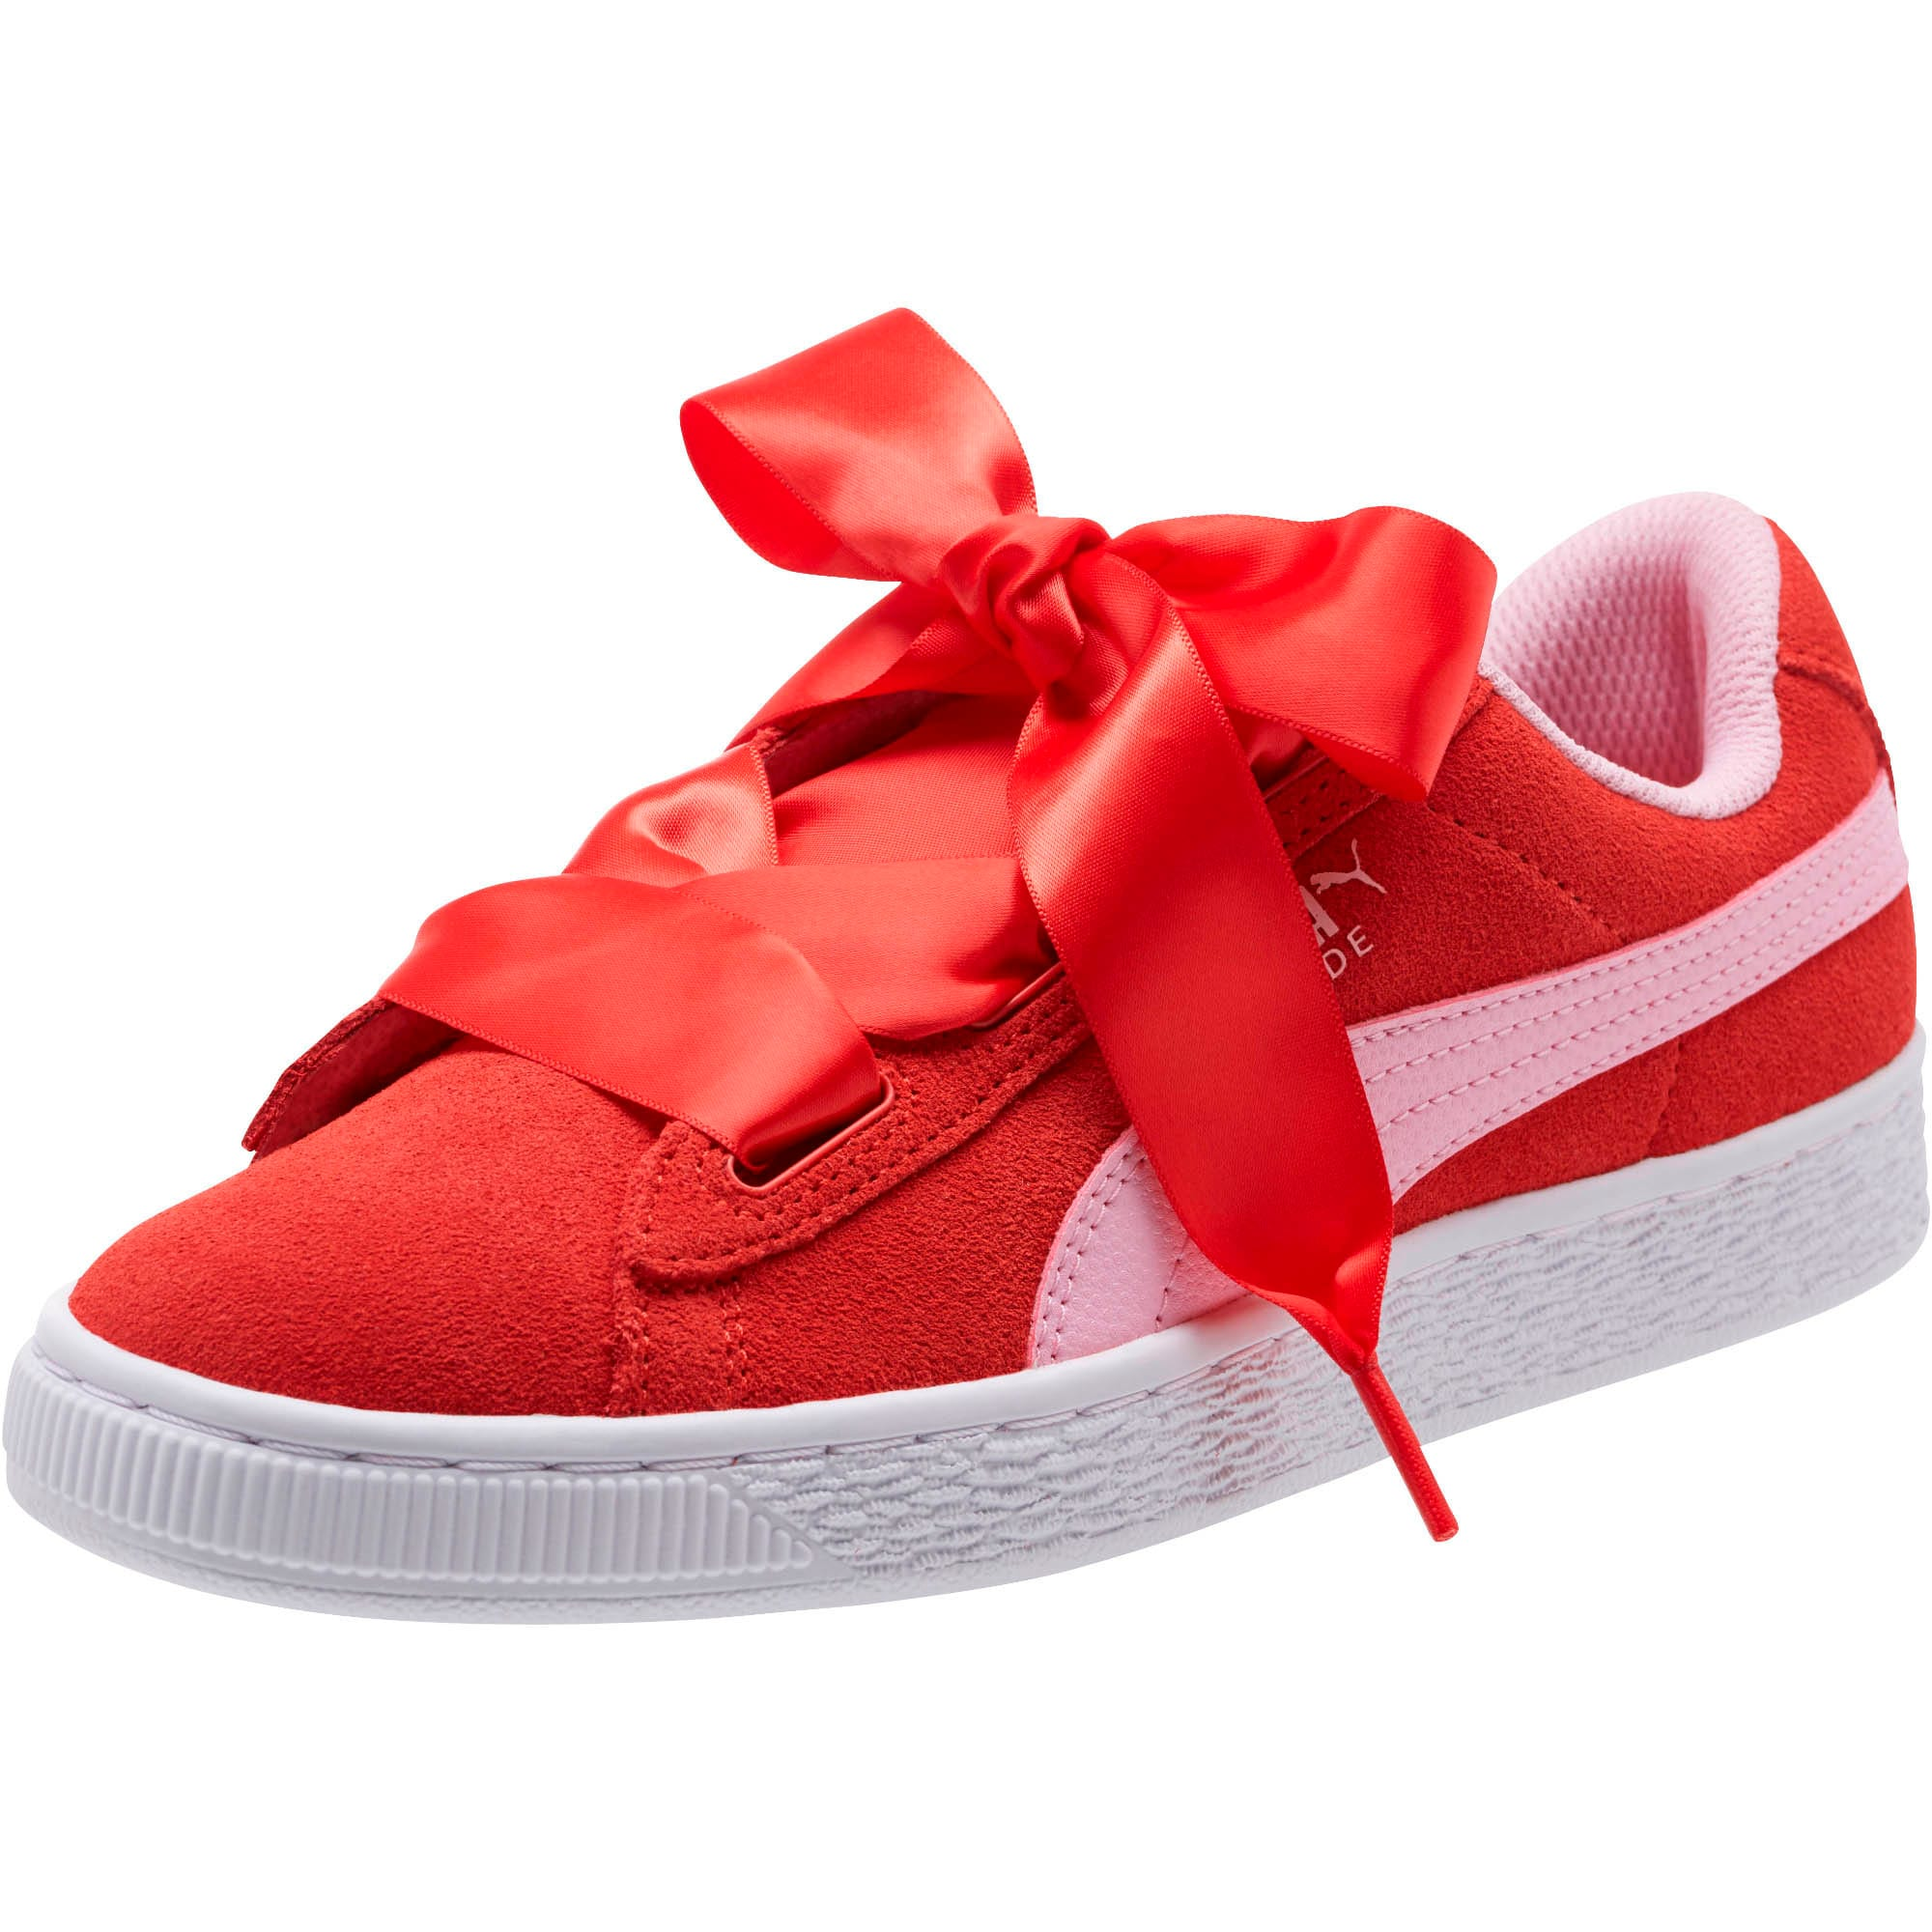 Thumbnail 1 of Suede Heart Radicals Sneakers JR, Hibiscus -Pale Pink, medium